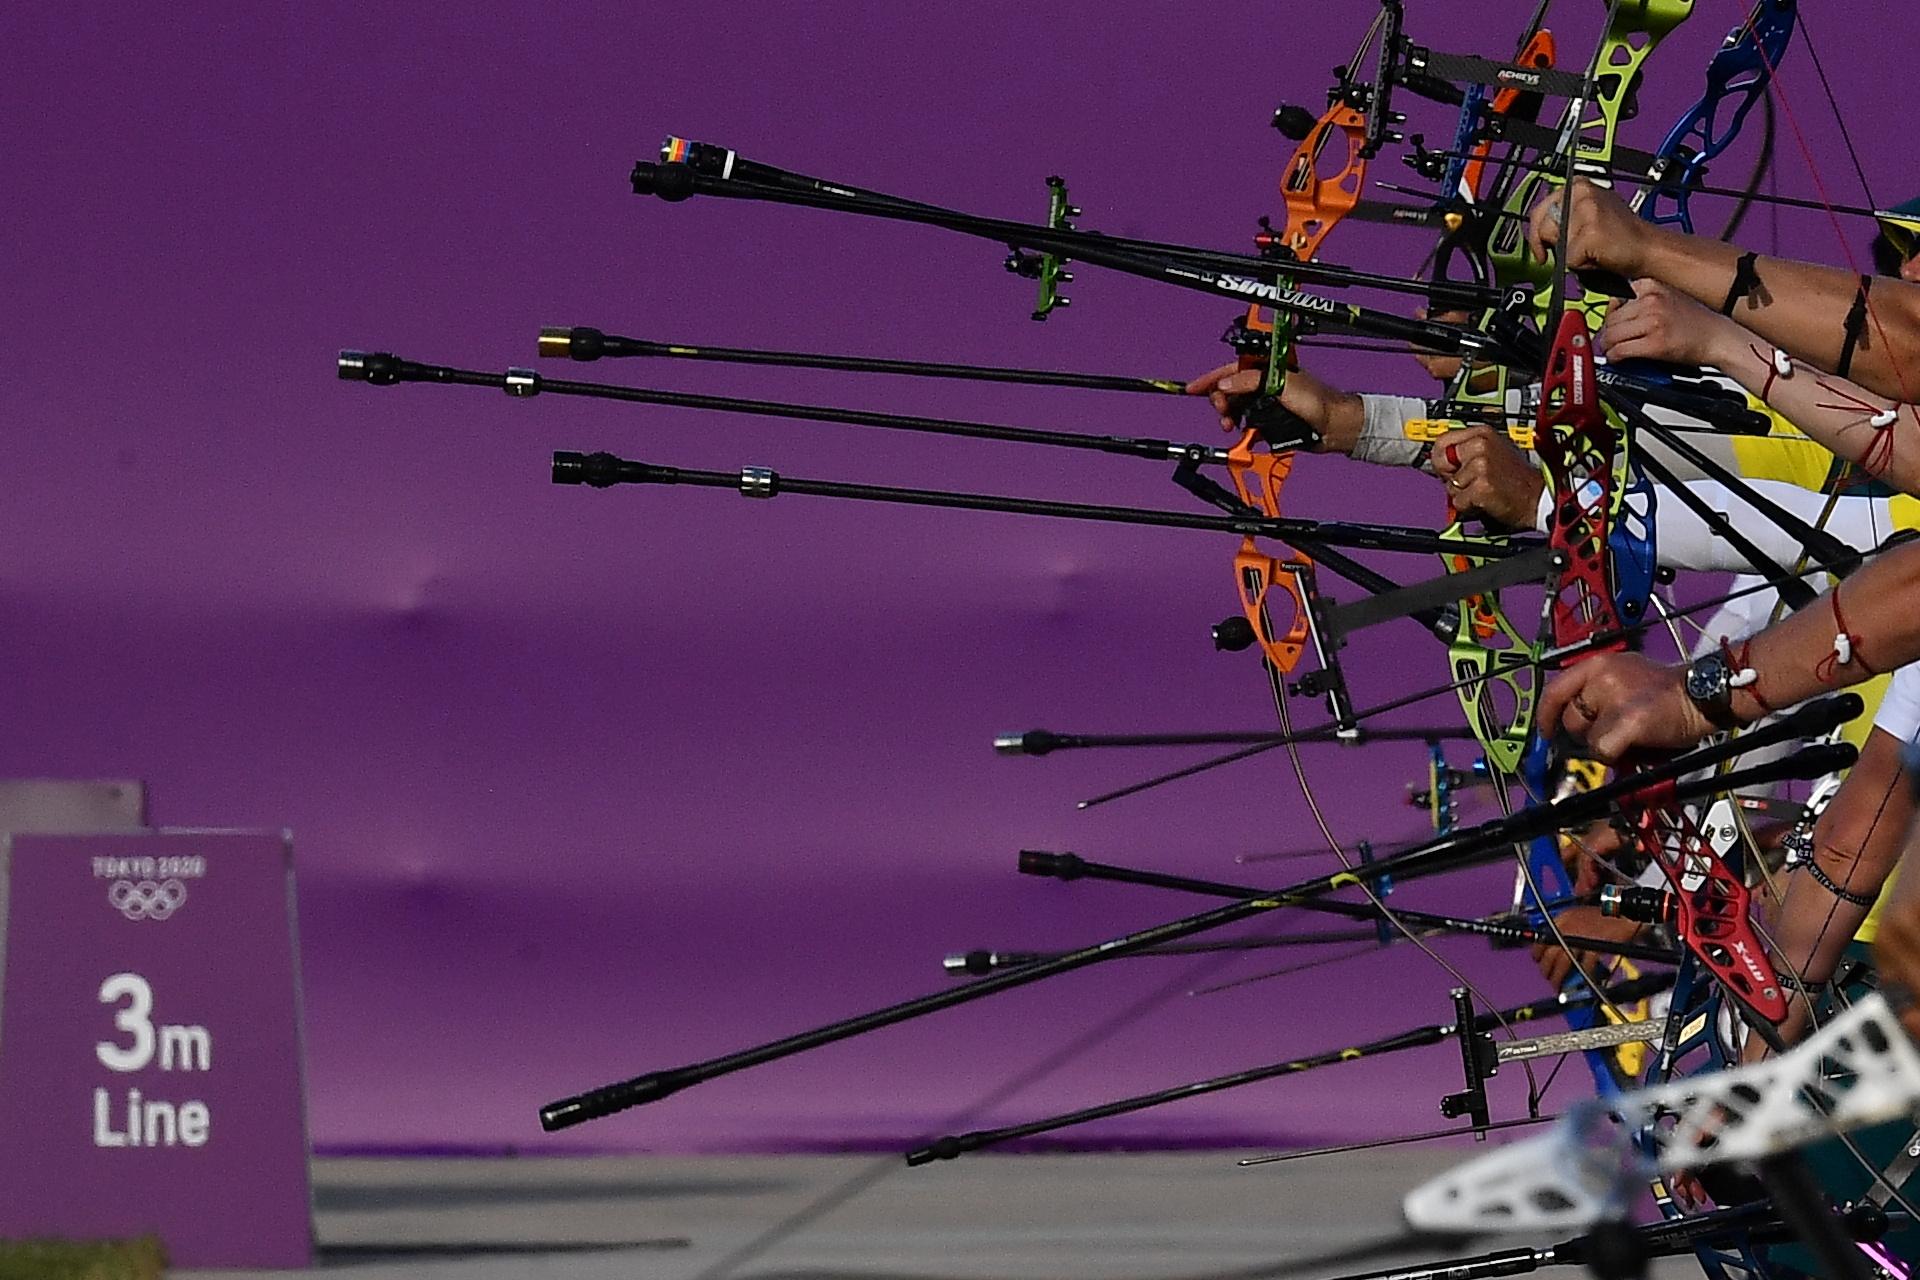 Tokyo 2020 Olympics - Archery Training Sessions - Yumenoshima Archery Field, Tokyo, Japan - July 21, 2021. Archers hold their bows during a day of ranking. REUTERS/Clodagh Kilcoyne